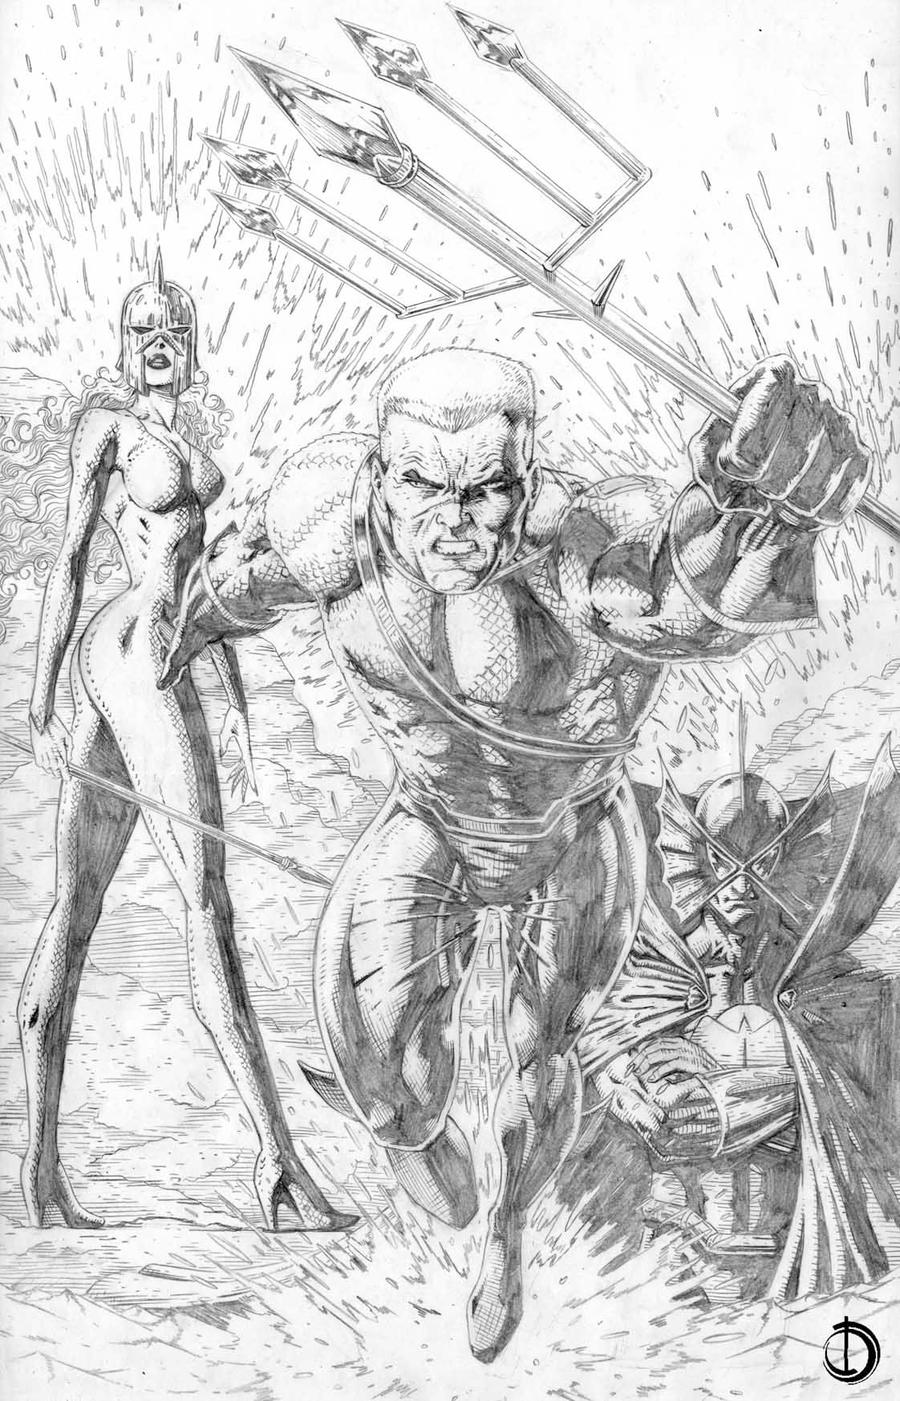 Aquaman Pin-up by santiagocomics